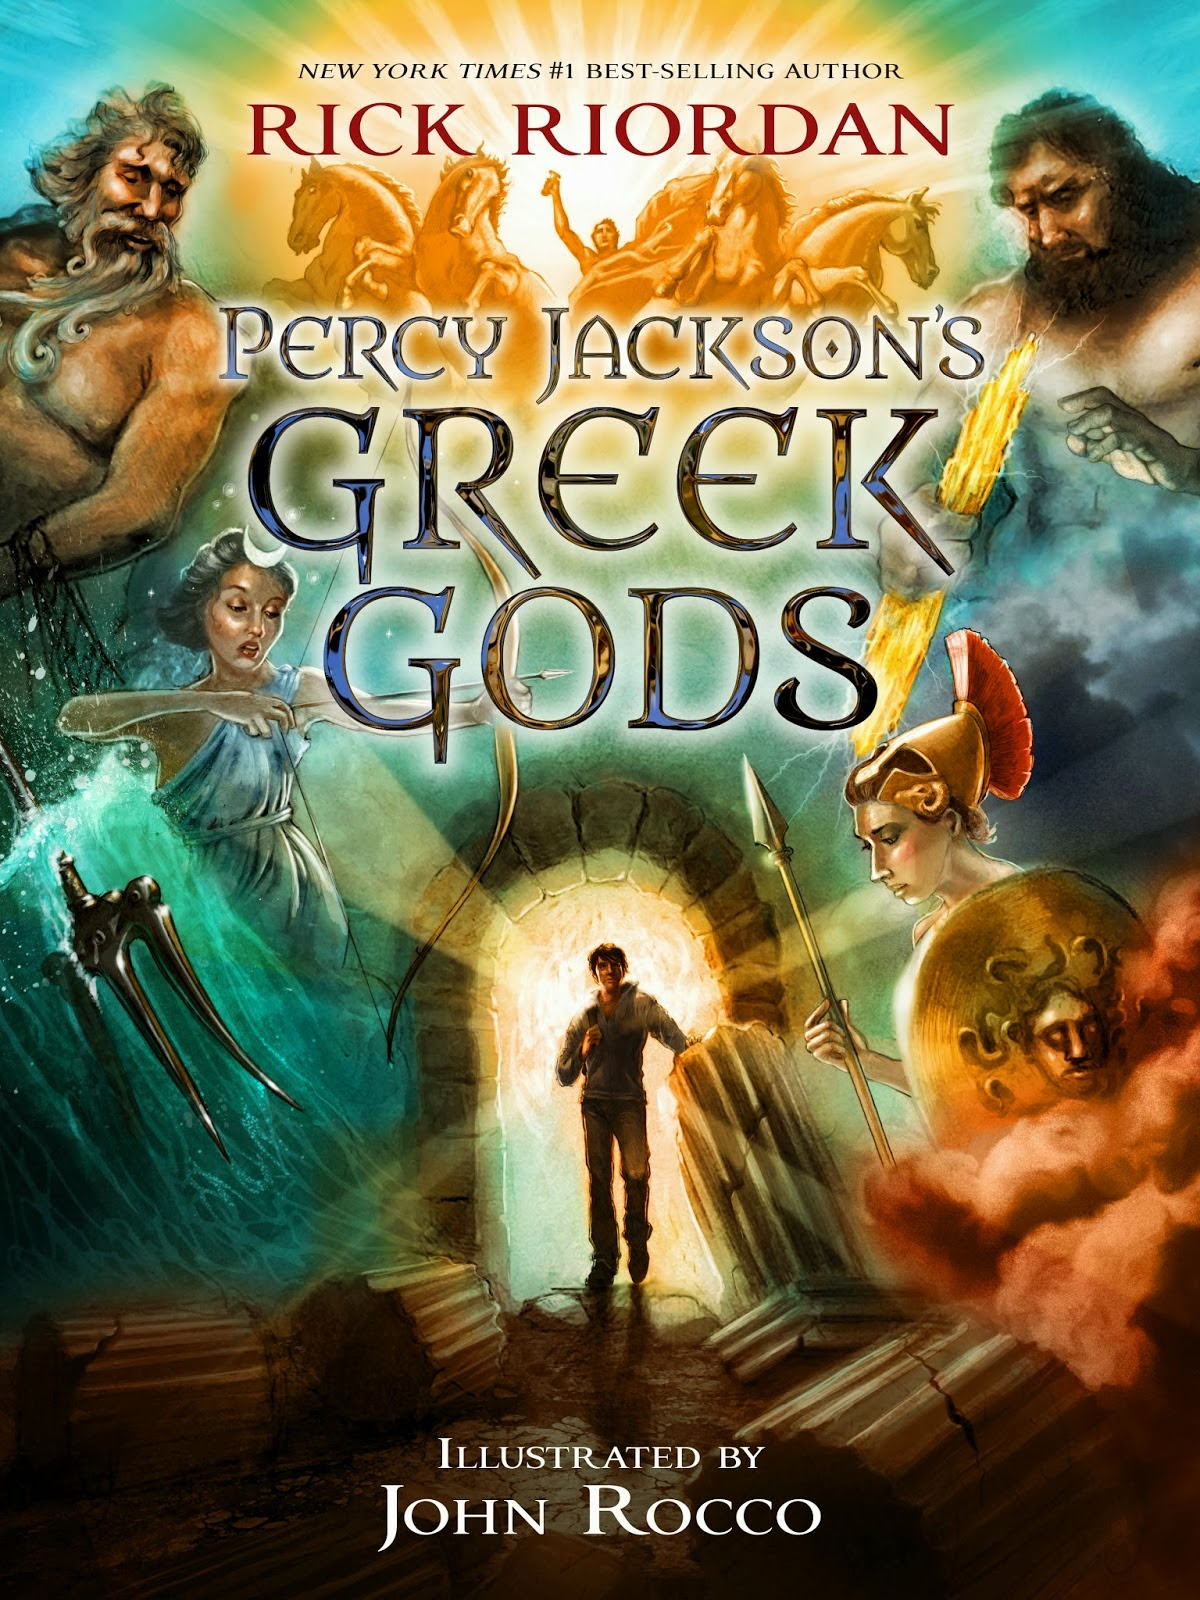 Portada estadounidense de Percy Jackson's Greek Gods